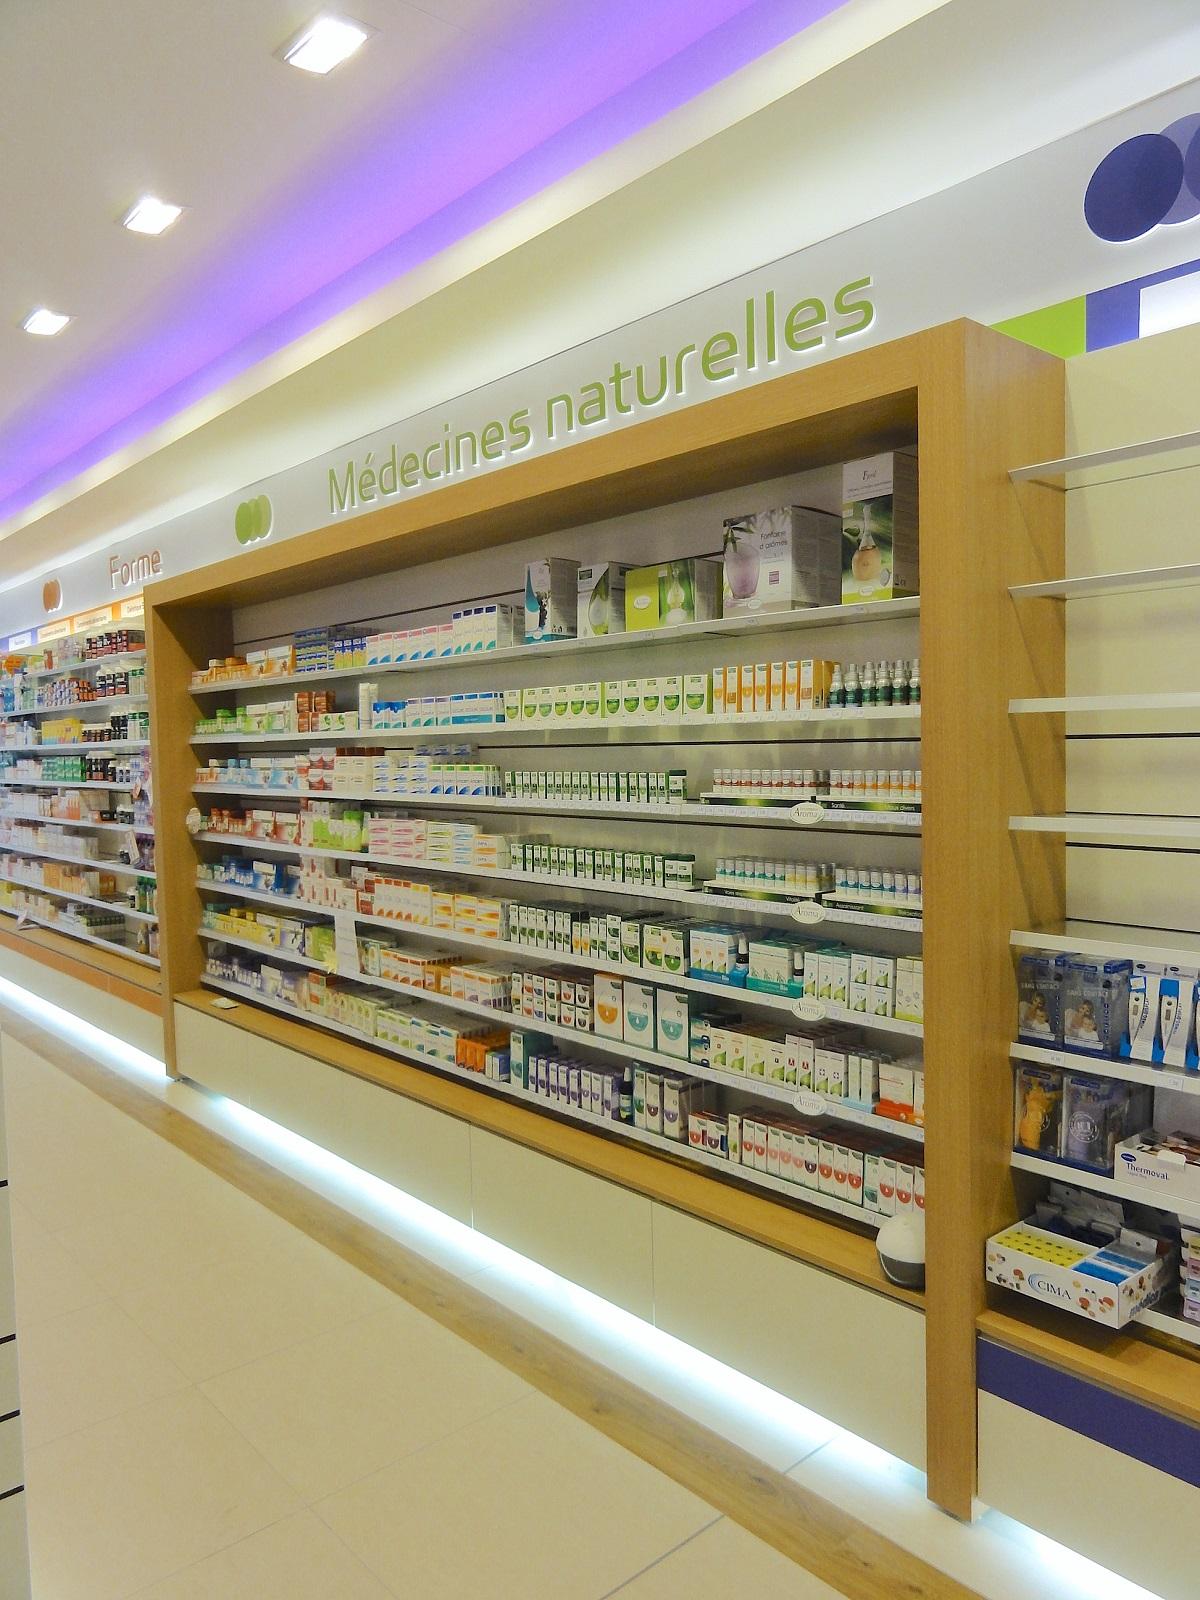 dimitri-danger-maitre-oeuvre-pharmacie-normandie03